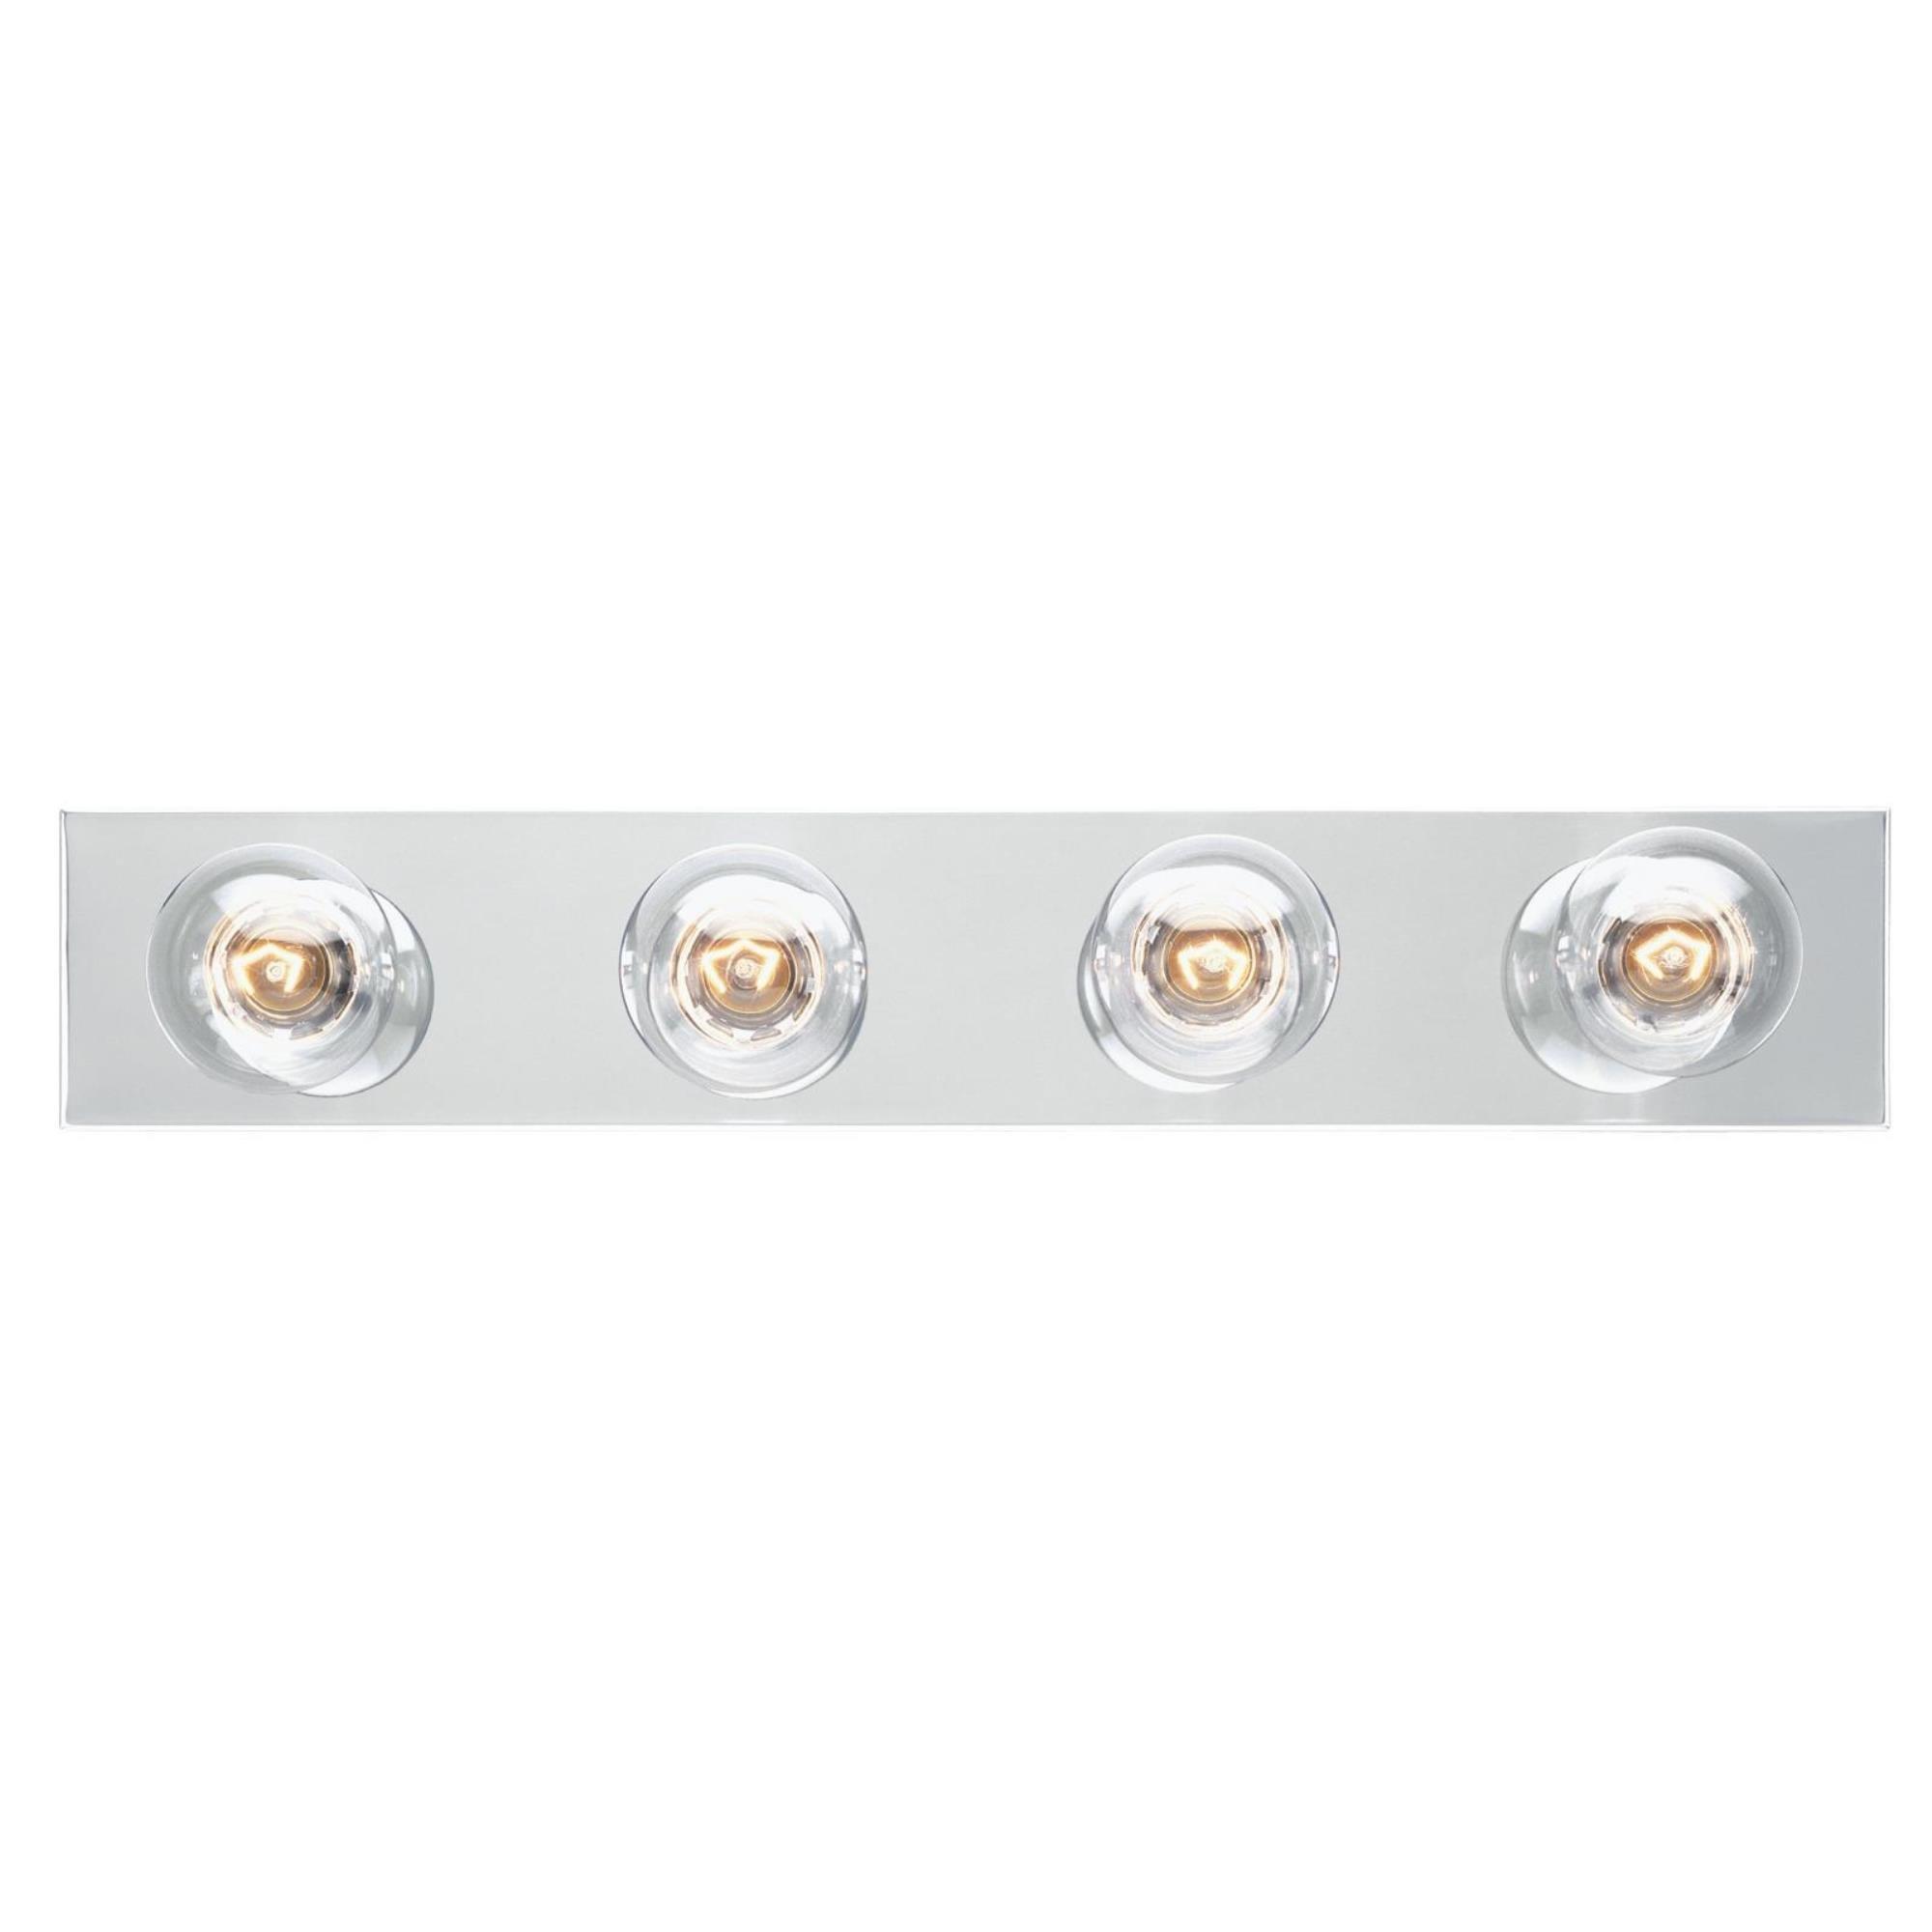 Westinghouse 6641100 Four-Light Bath Bar by Angelo Bros Company